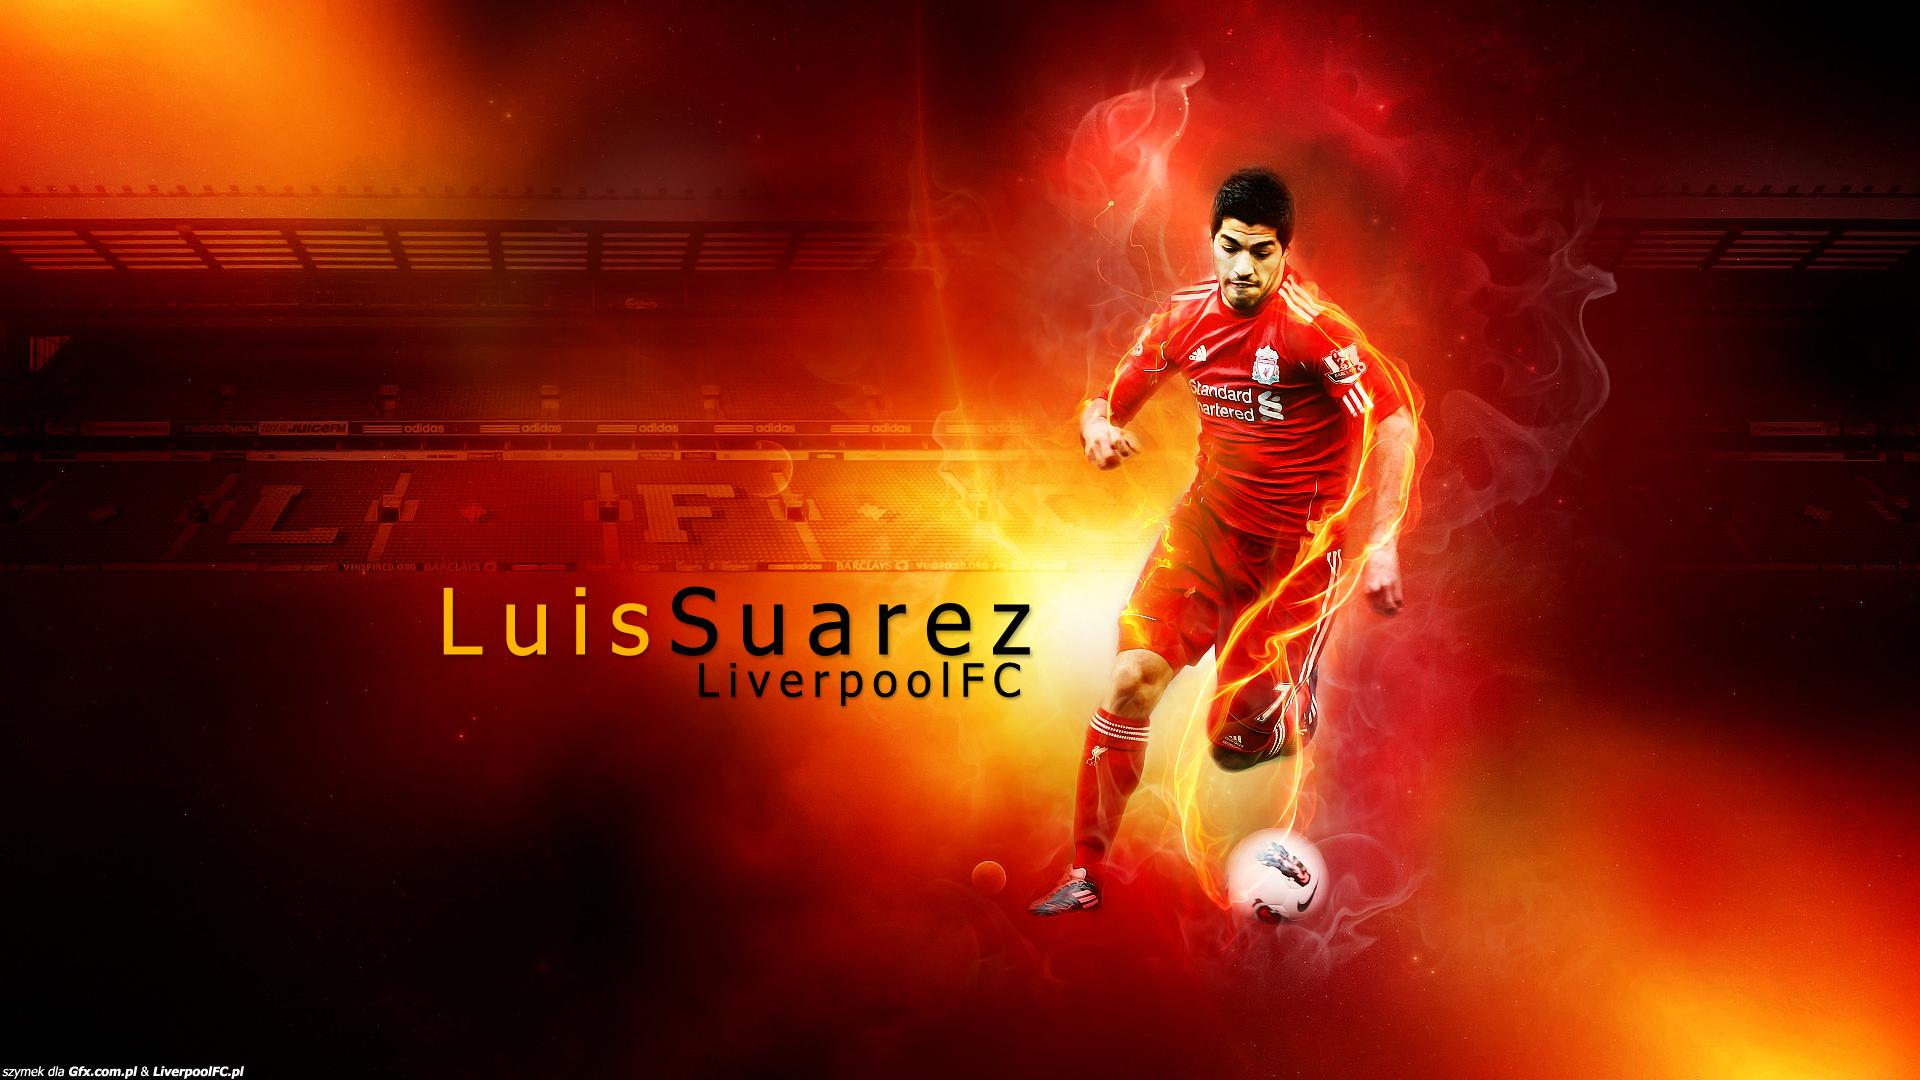 Luis Surez Liverpool Wallpaper   Football HD Wallpapers 1920x1080